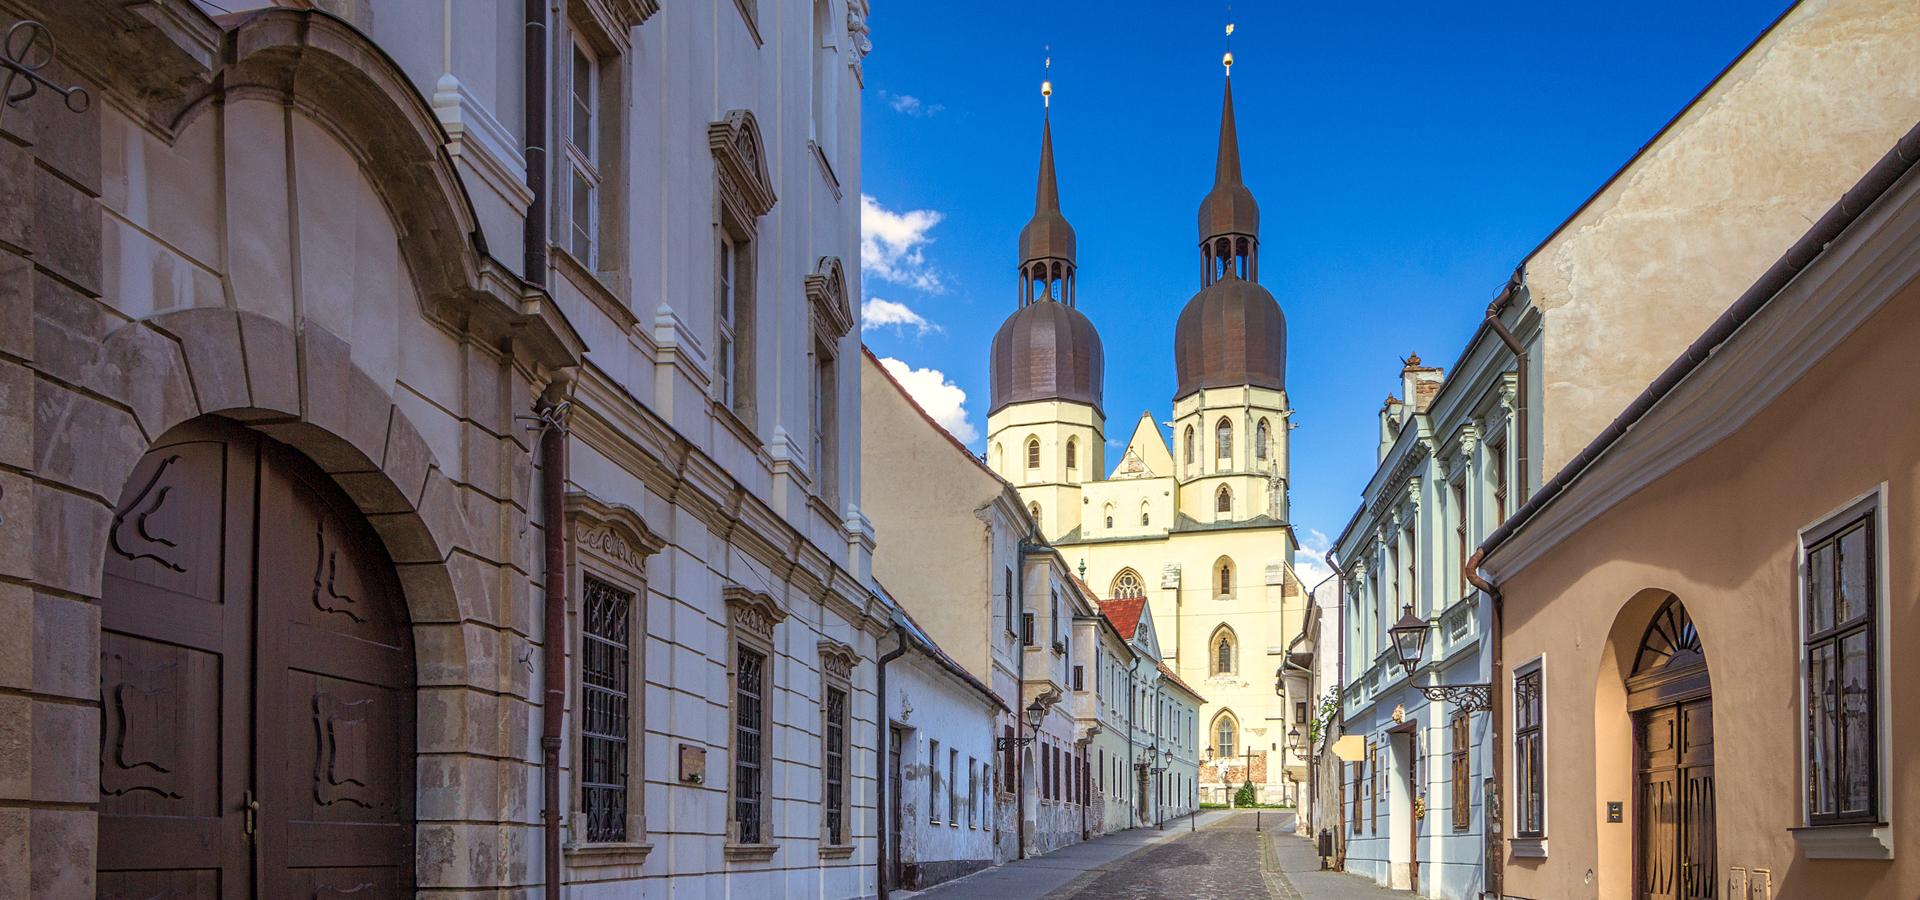 Peer-to-peer advisory in Trnava, Slovak Republic